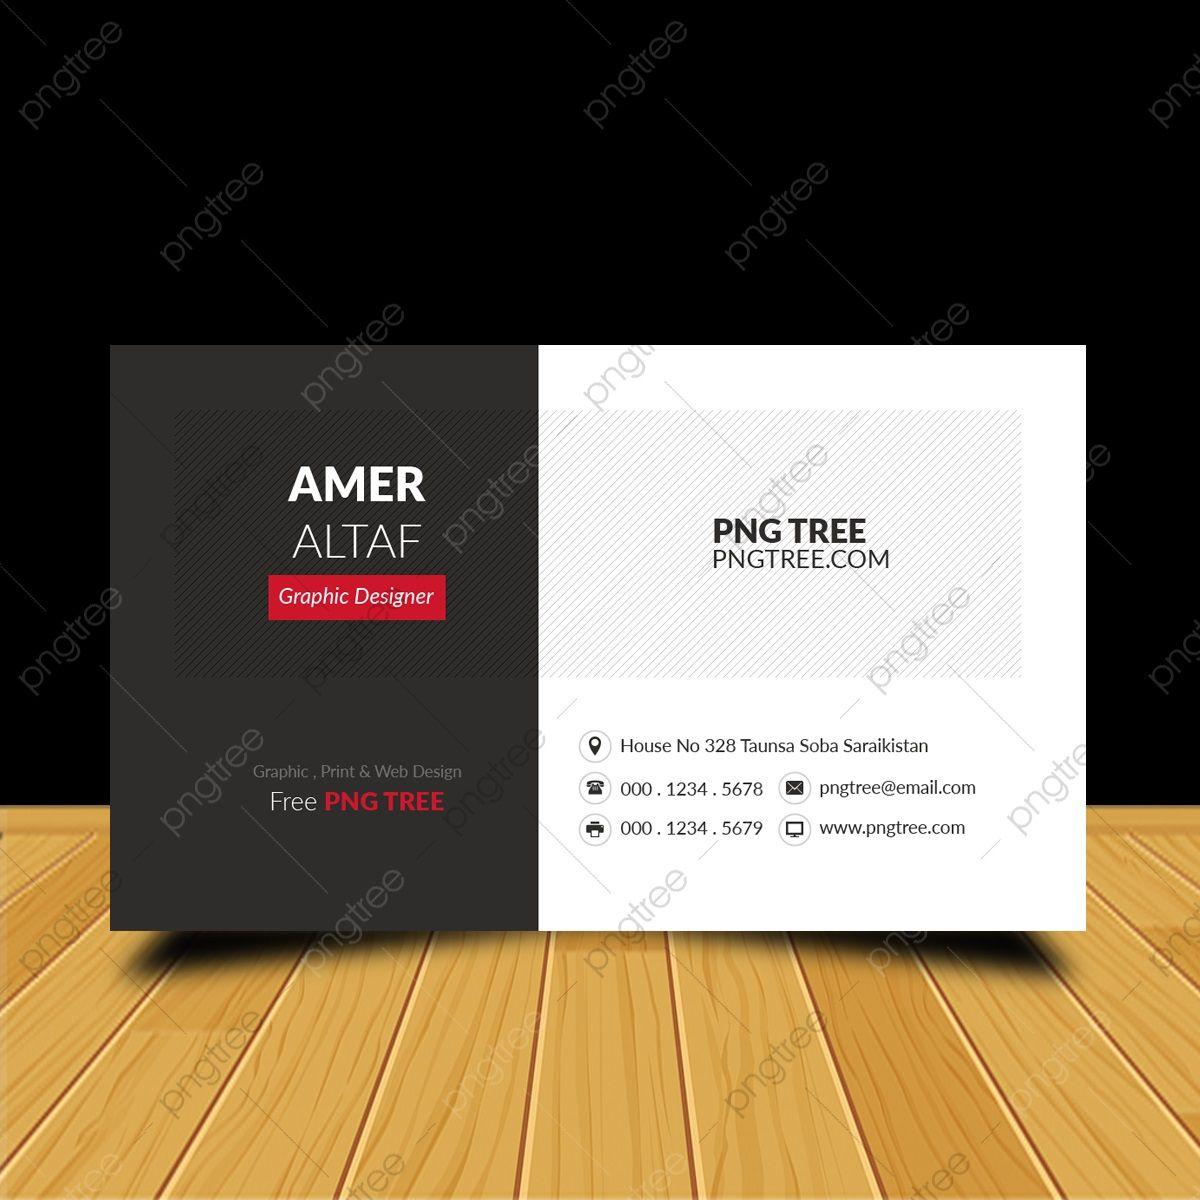 007 Surprising Simple Visiting Card Design Free Download Concept  Busines Psd Coreldraw FileFull